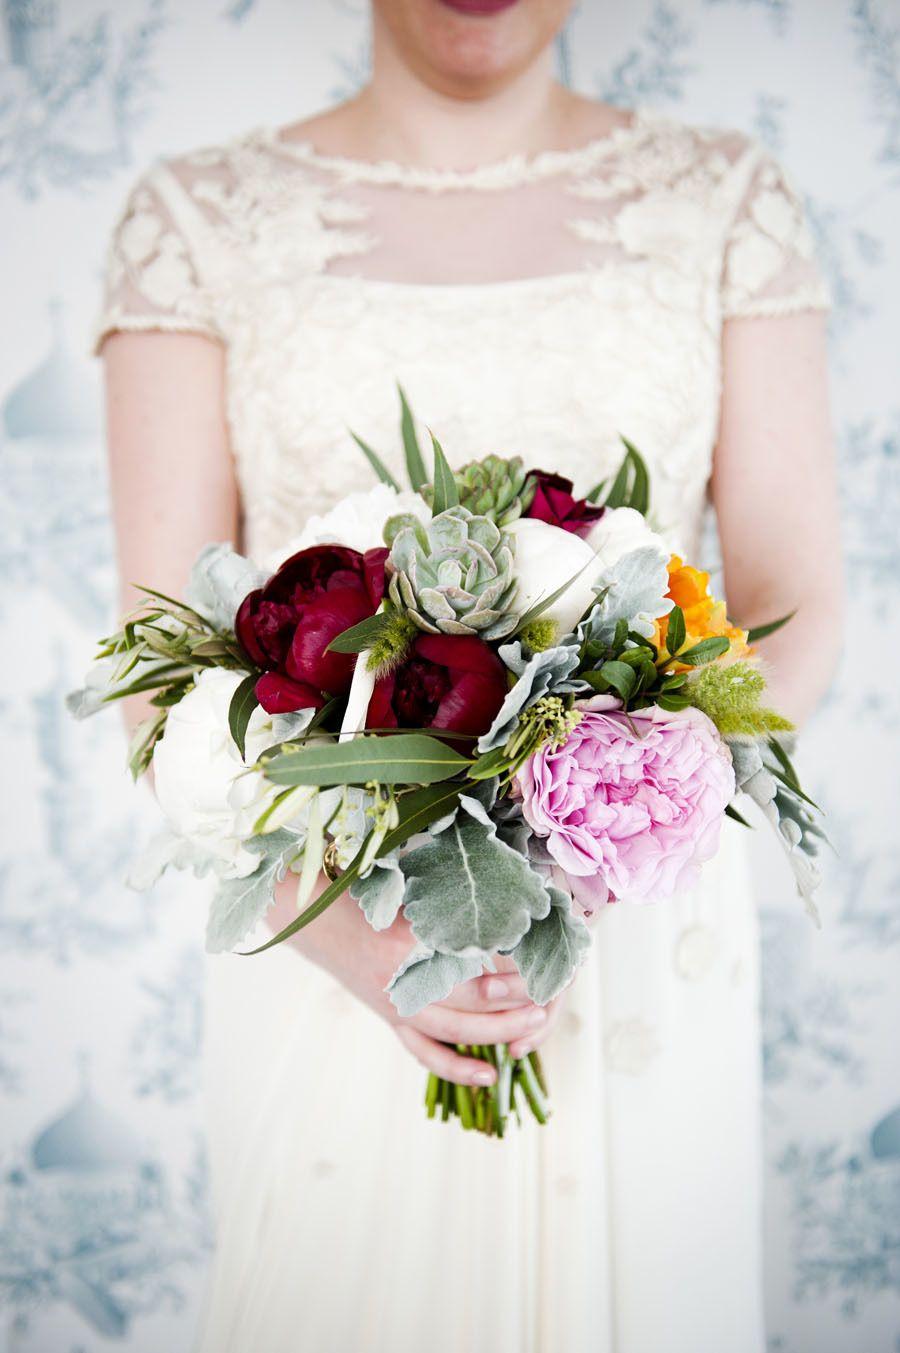 Textured peony and succulent bouquet. Photography: - khakibedfordphoto.com/